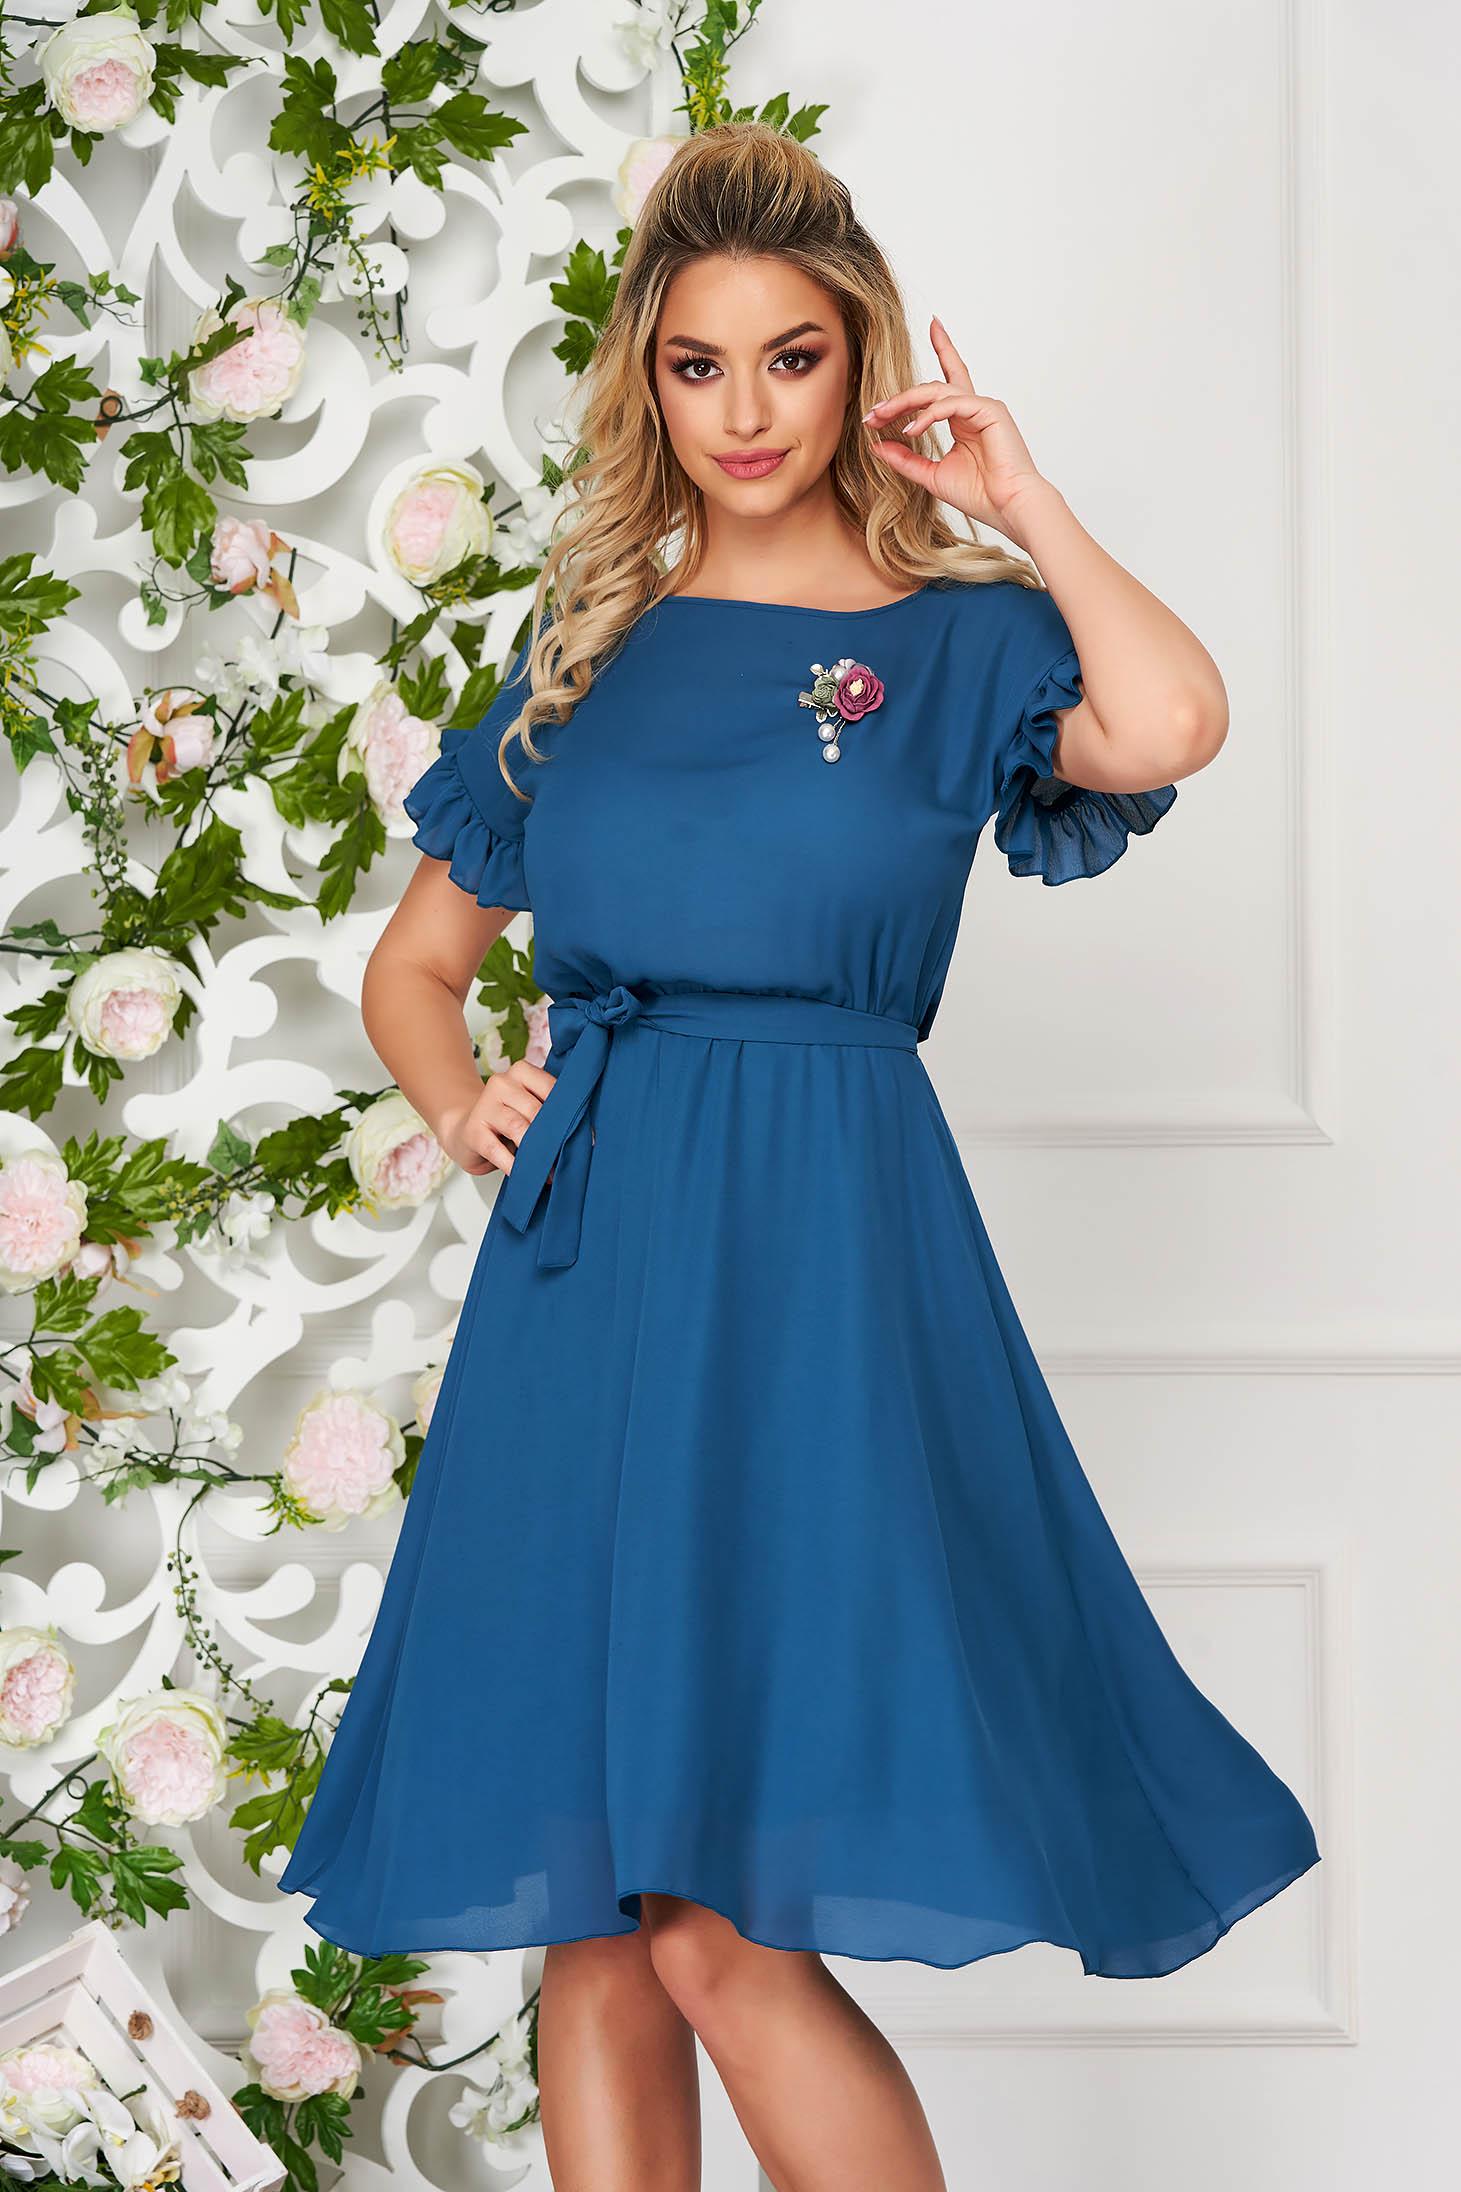 Dress StarShinerS turquoise elegant midi daily cloche thin fabric with ruffled sleeves